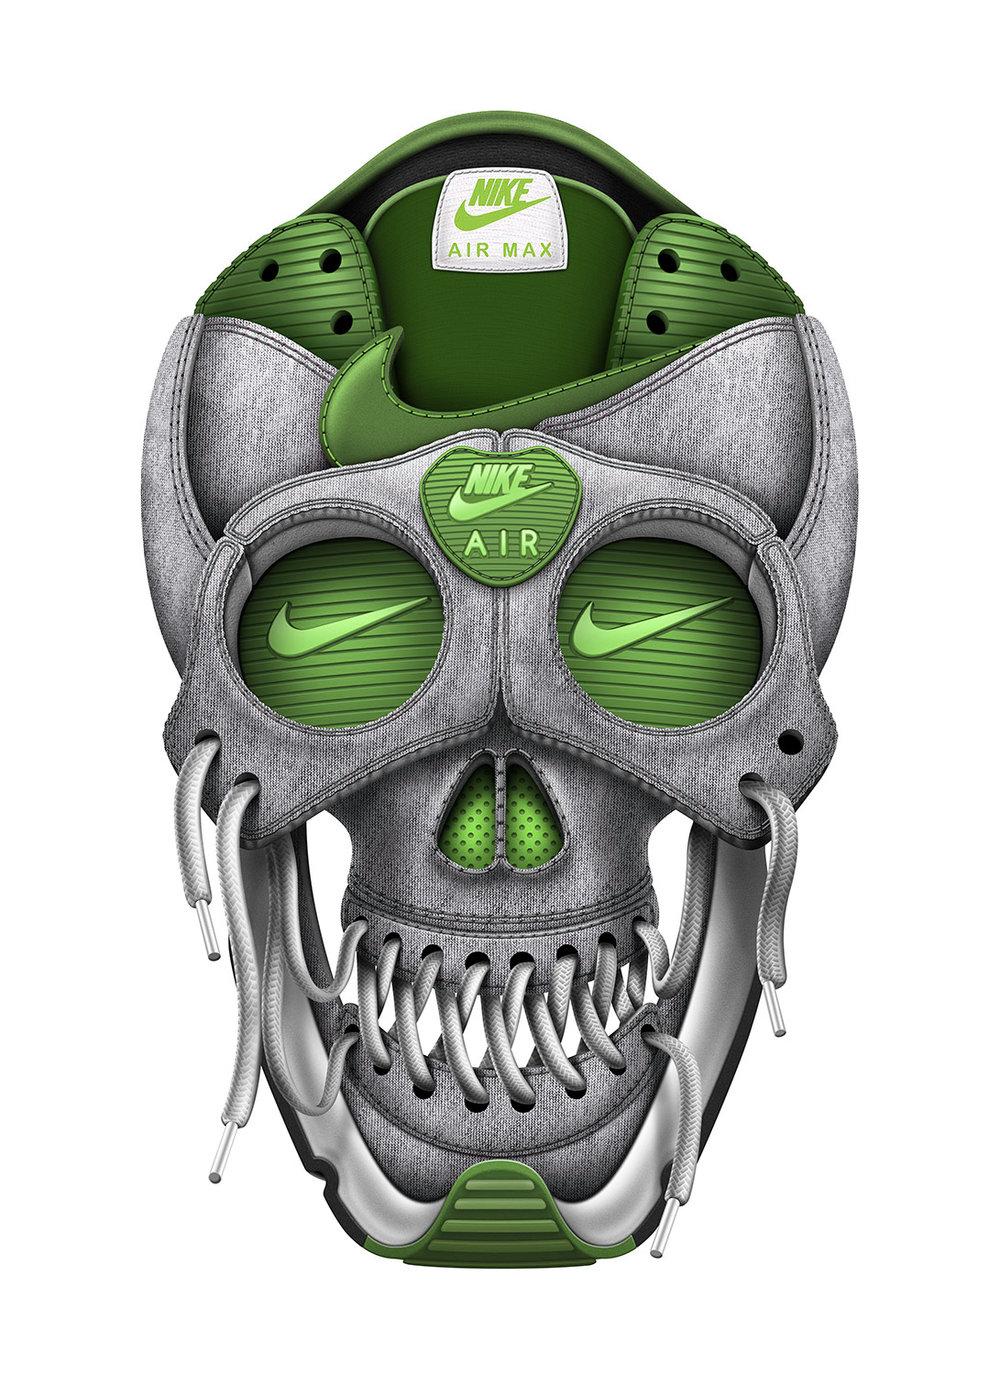 130925_Nike_skull_airmax_grey-blue_02B.jpg